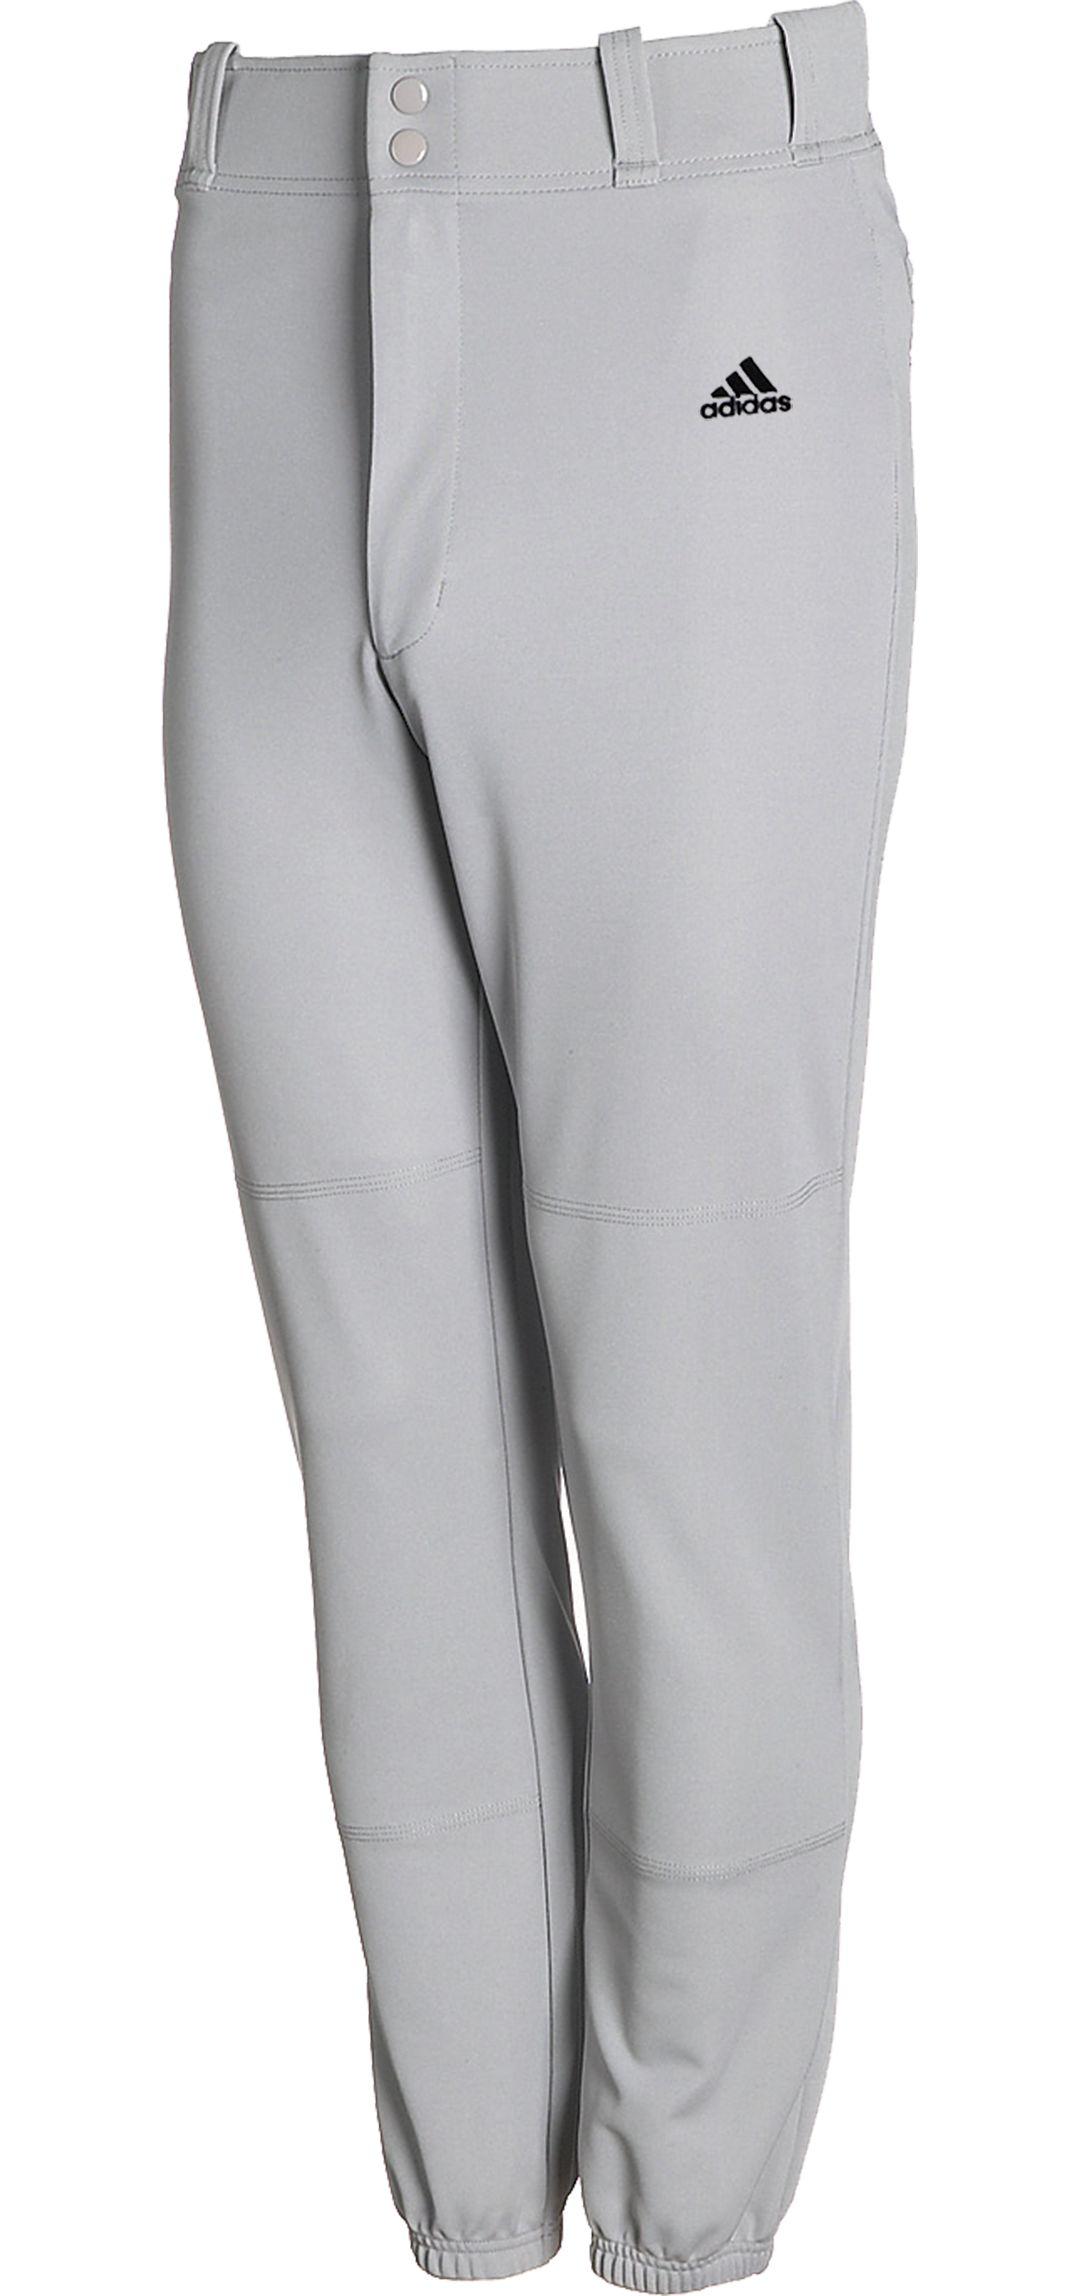 8a6db36c0 adidas Boys' Incite Closed Bottom Baseball Pants   DICK'S Sporting Goods